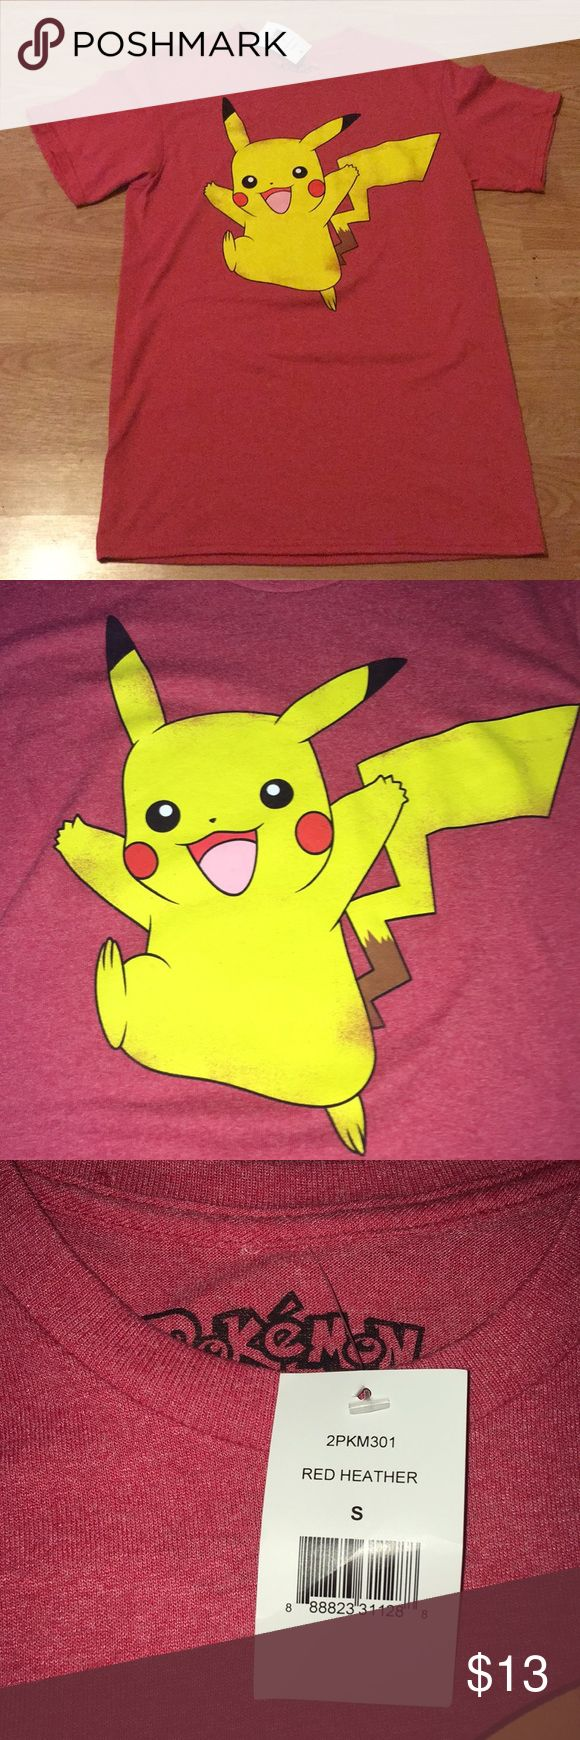 BNWT Pokémon Picachu T-Shirt BNWT  Never worn Pokemon Shirts